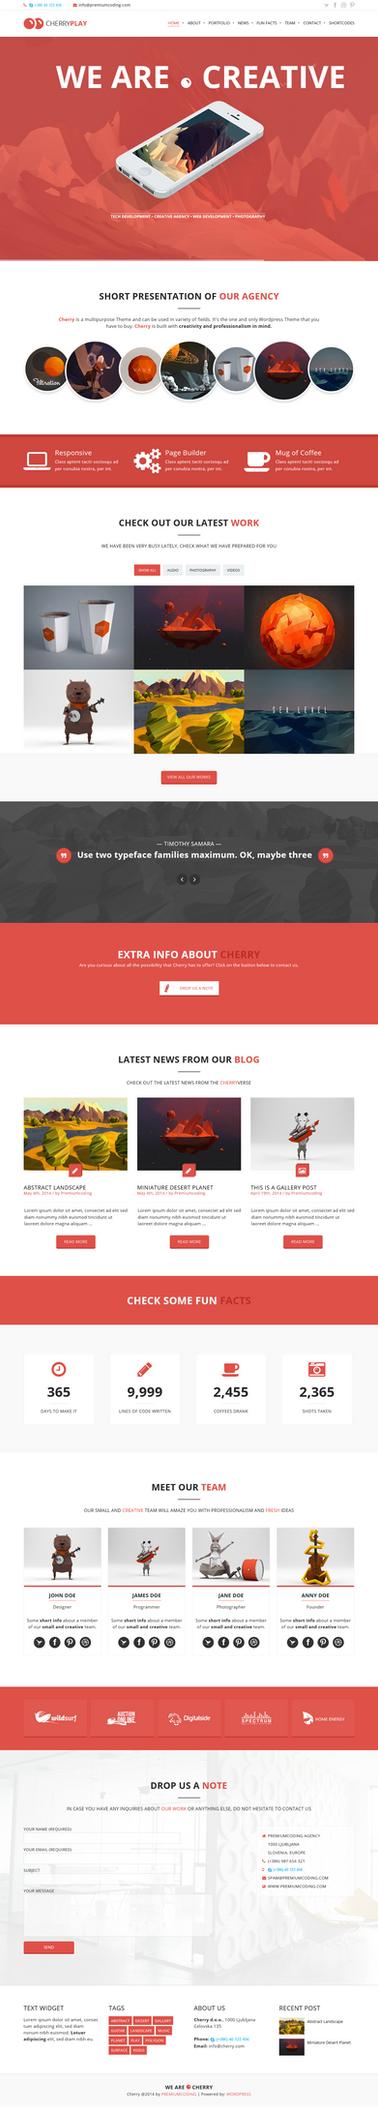 Cherry - Multi Page Theme by sandracz